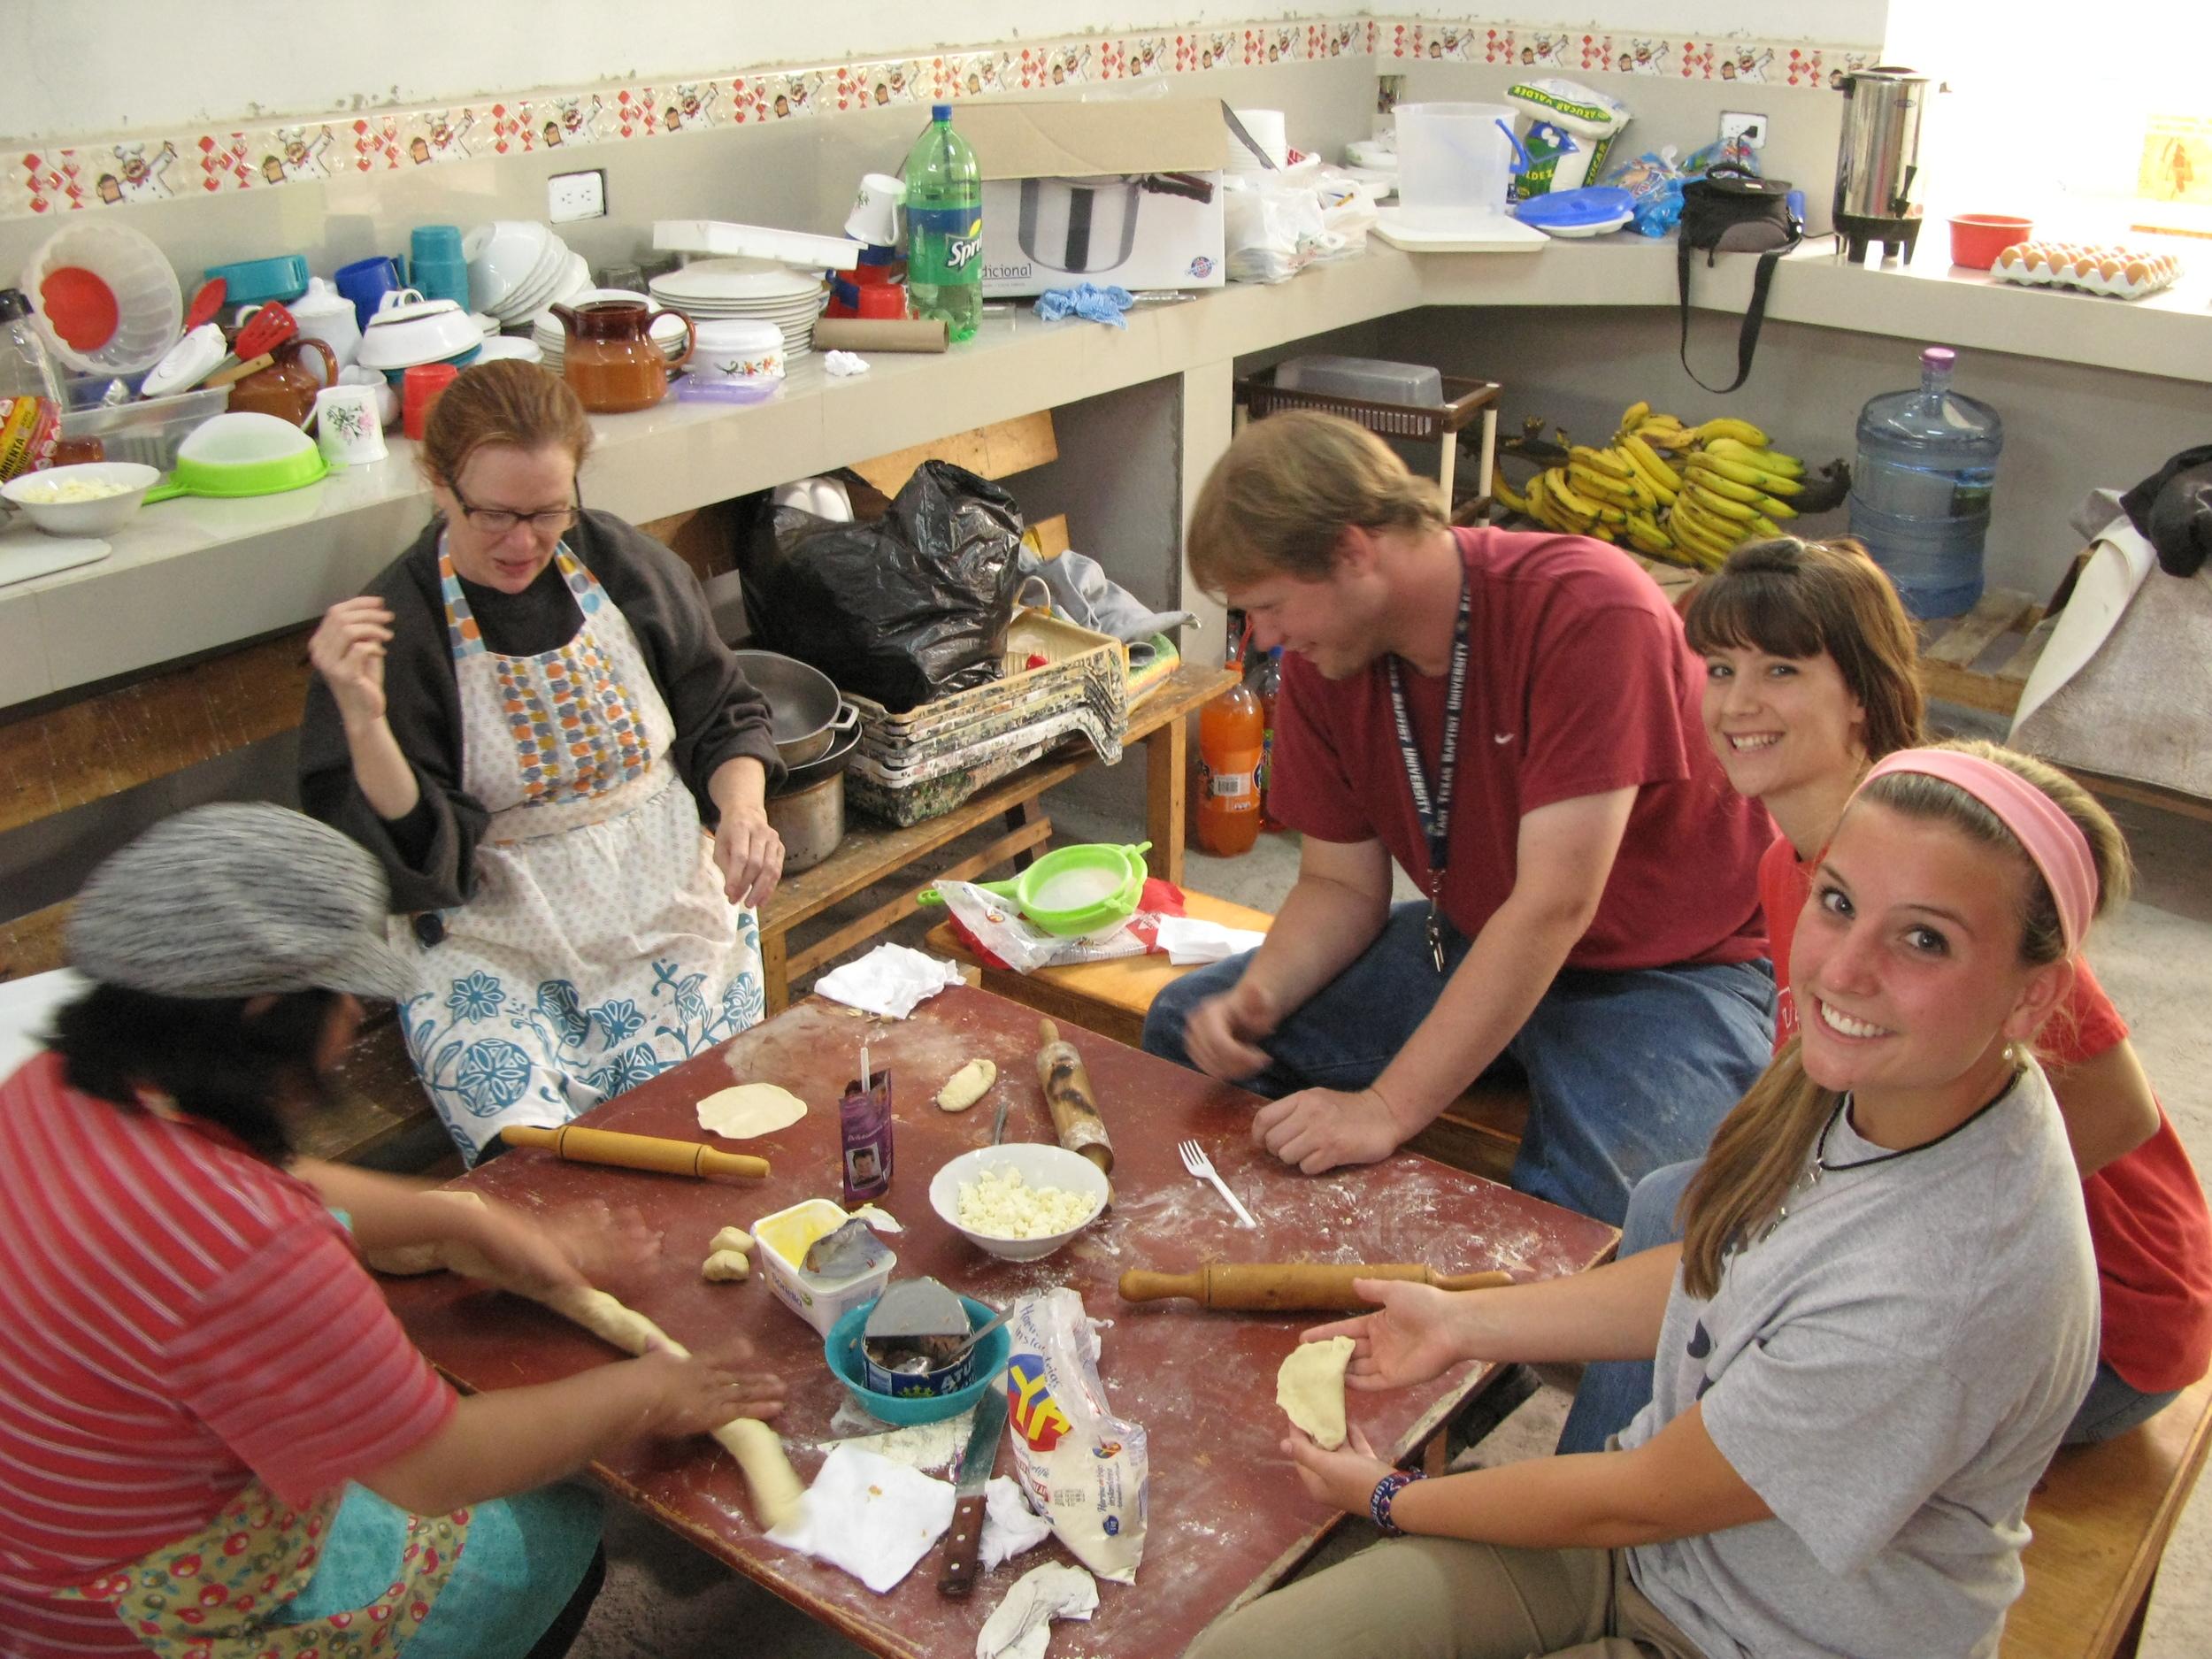 Jenny, pastor Hernan's wife, teaching North Americans how to make empanadas